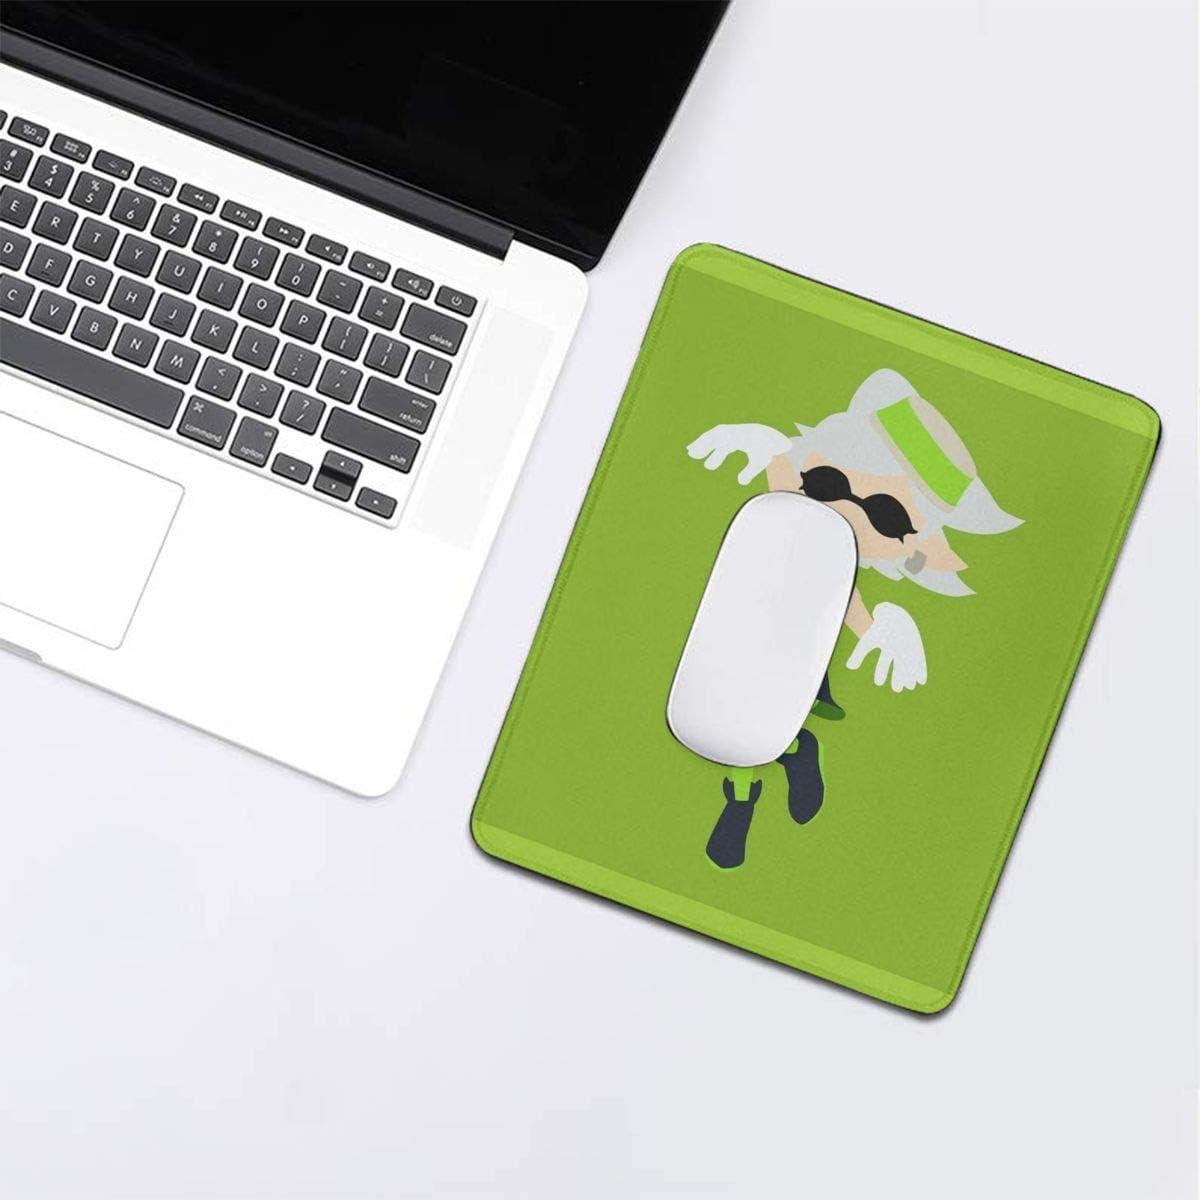 Mari Takahashi Hemming The Mouse Pad 10 X 12 Inch Esports Office Study Computer